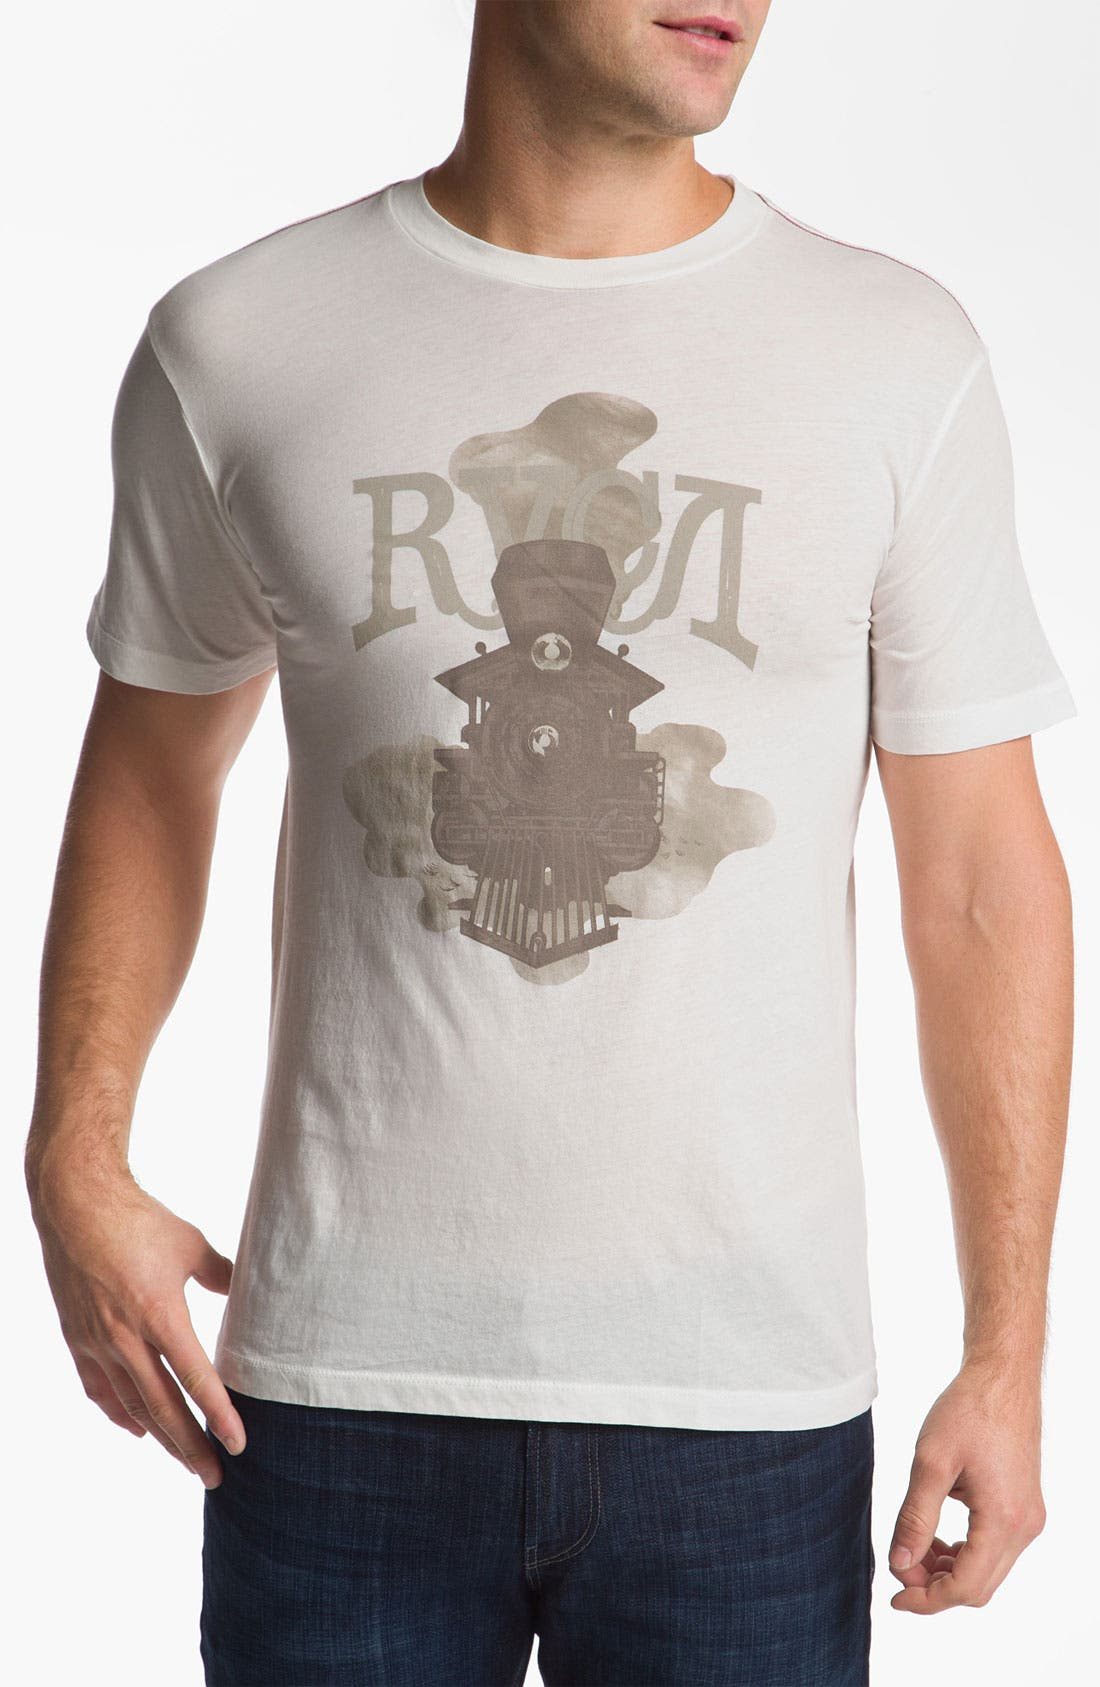 Alternate Image 1 Selected - RVCA 'Locomotive' Vintage Wash T-Shirt